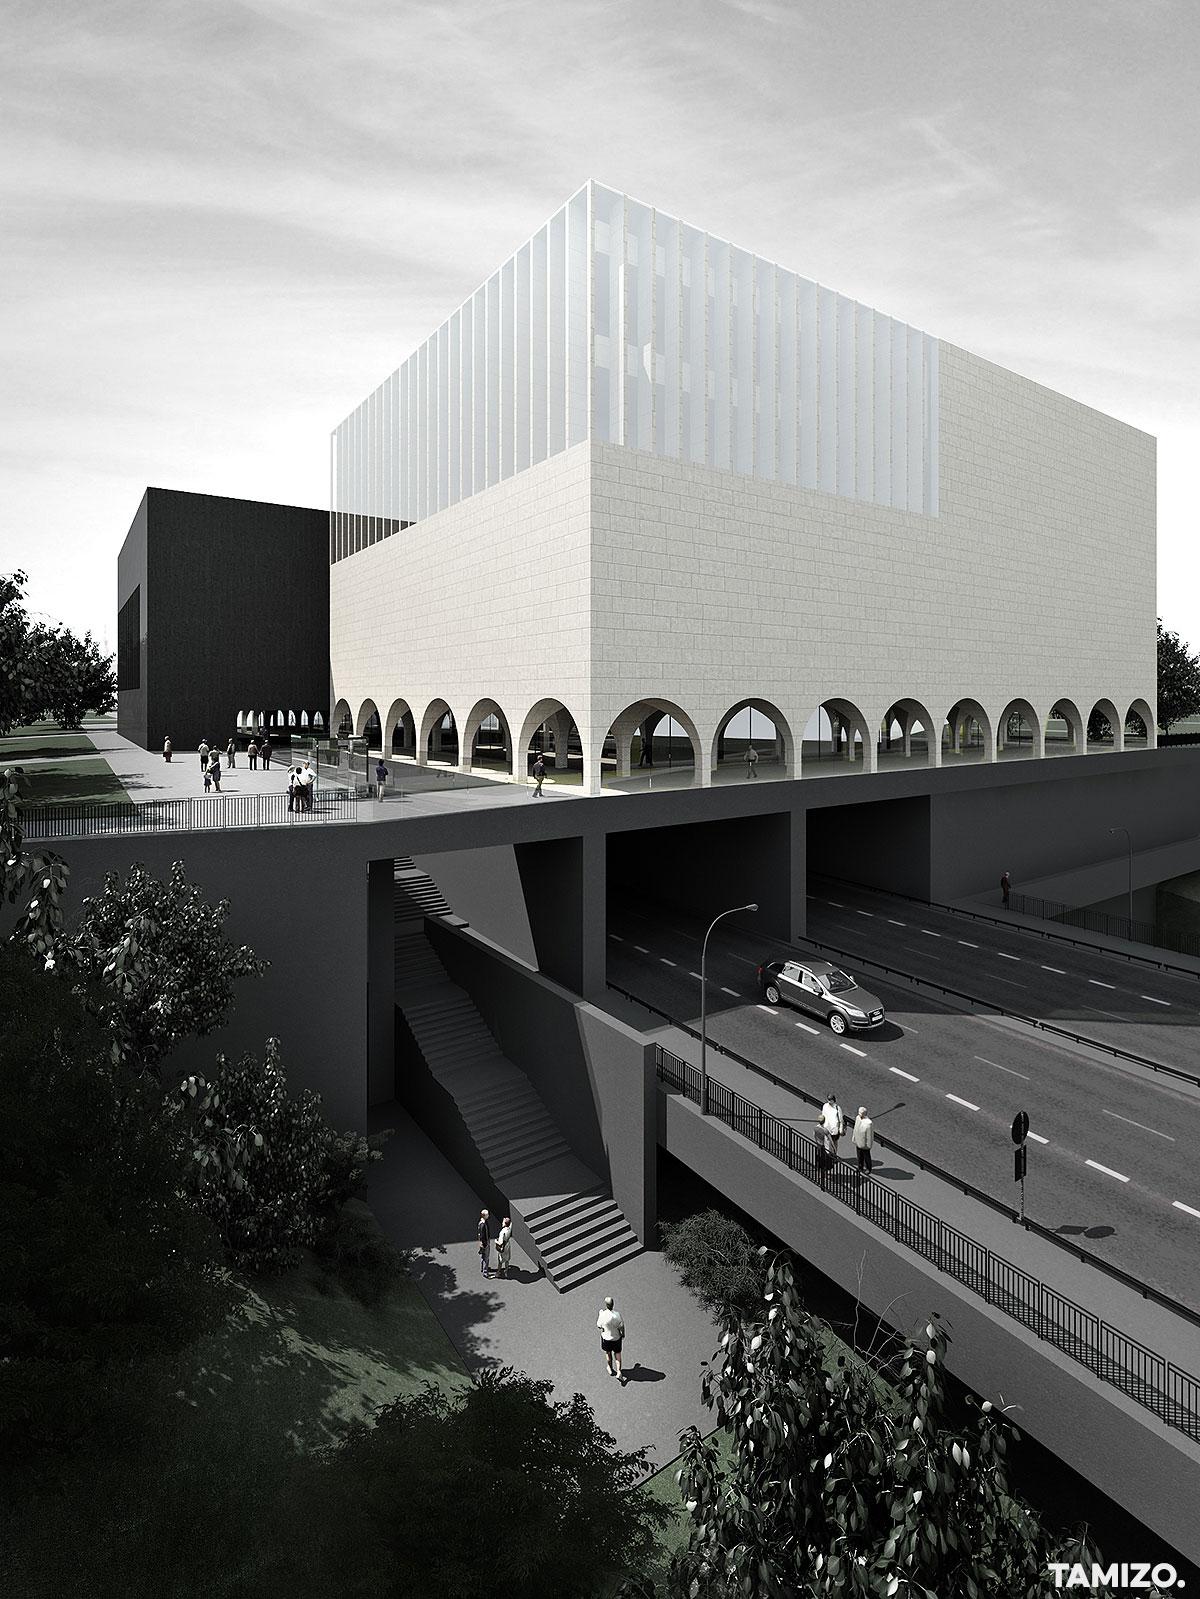 A037_tamizo_architekci_projekt_konkurs_muzeum_historii_polski_04